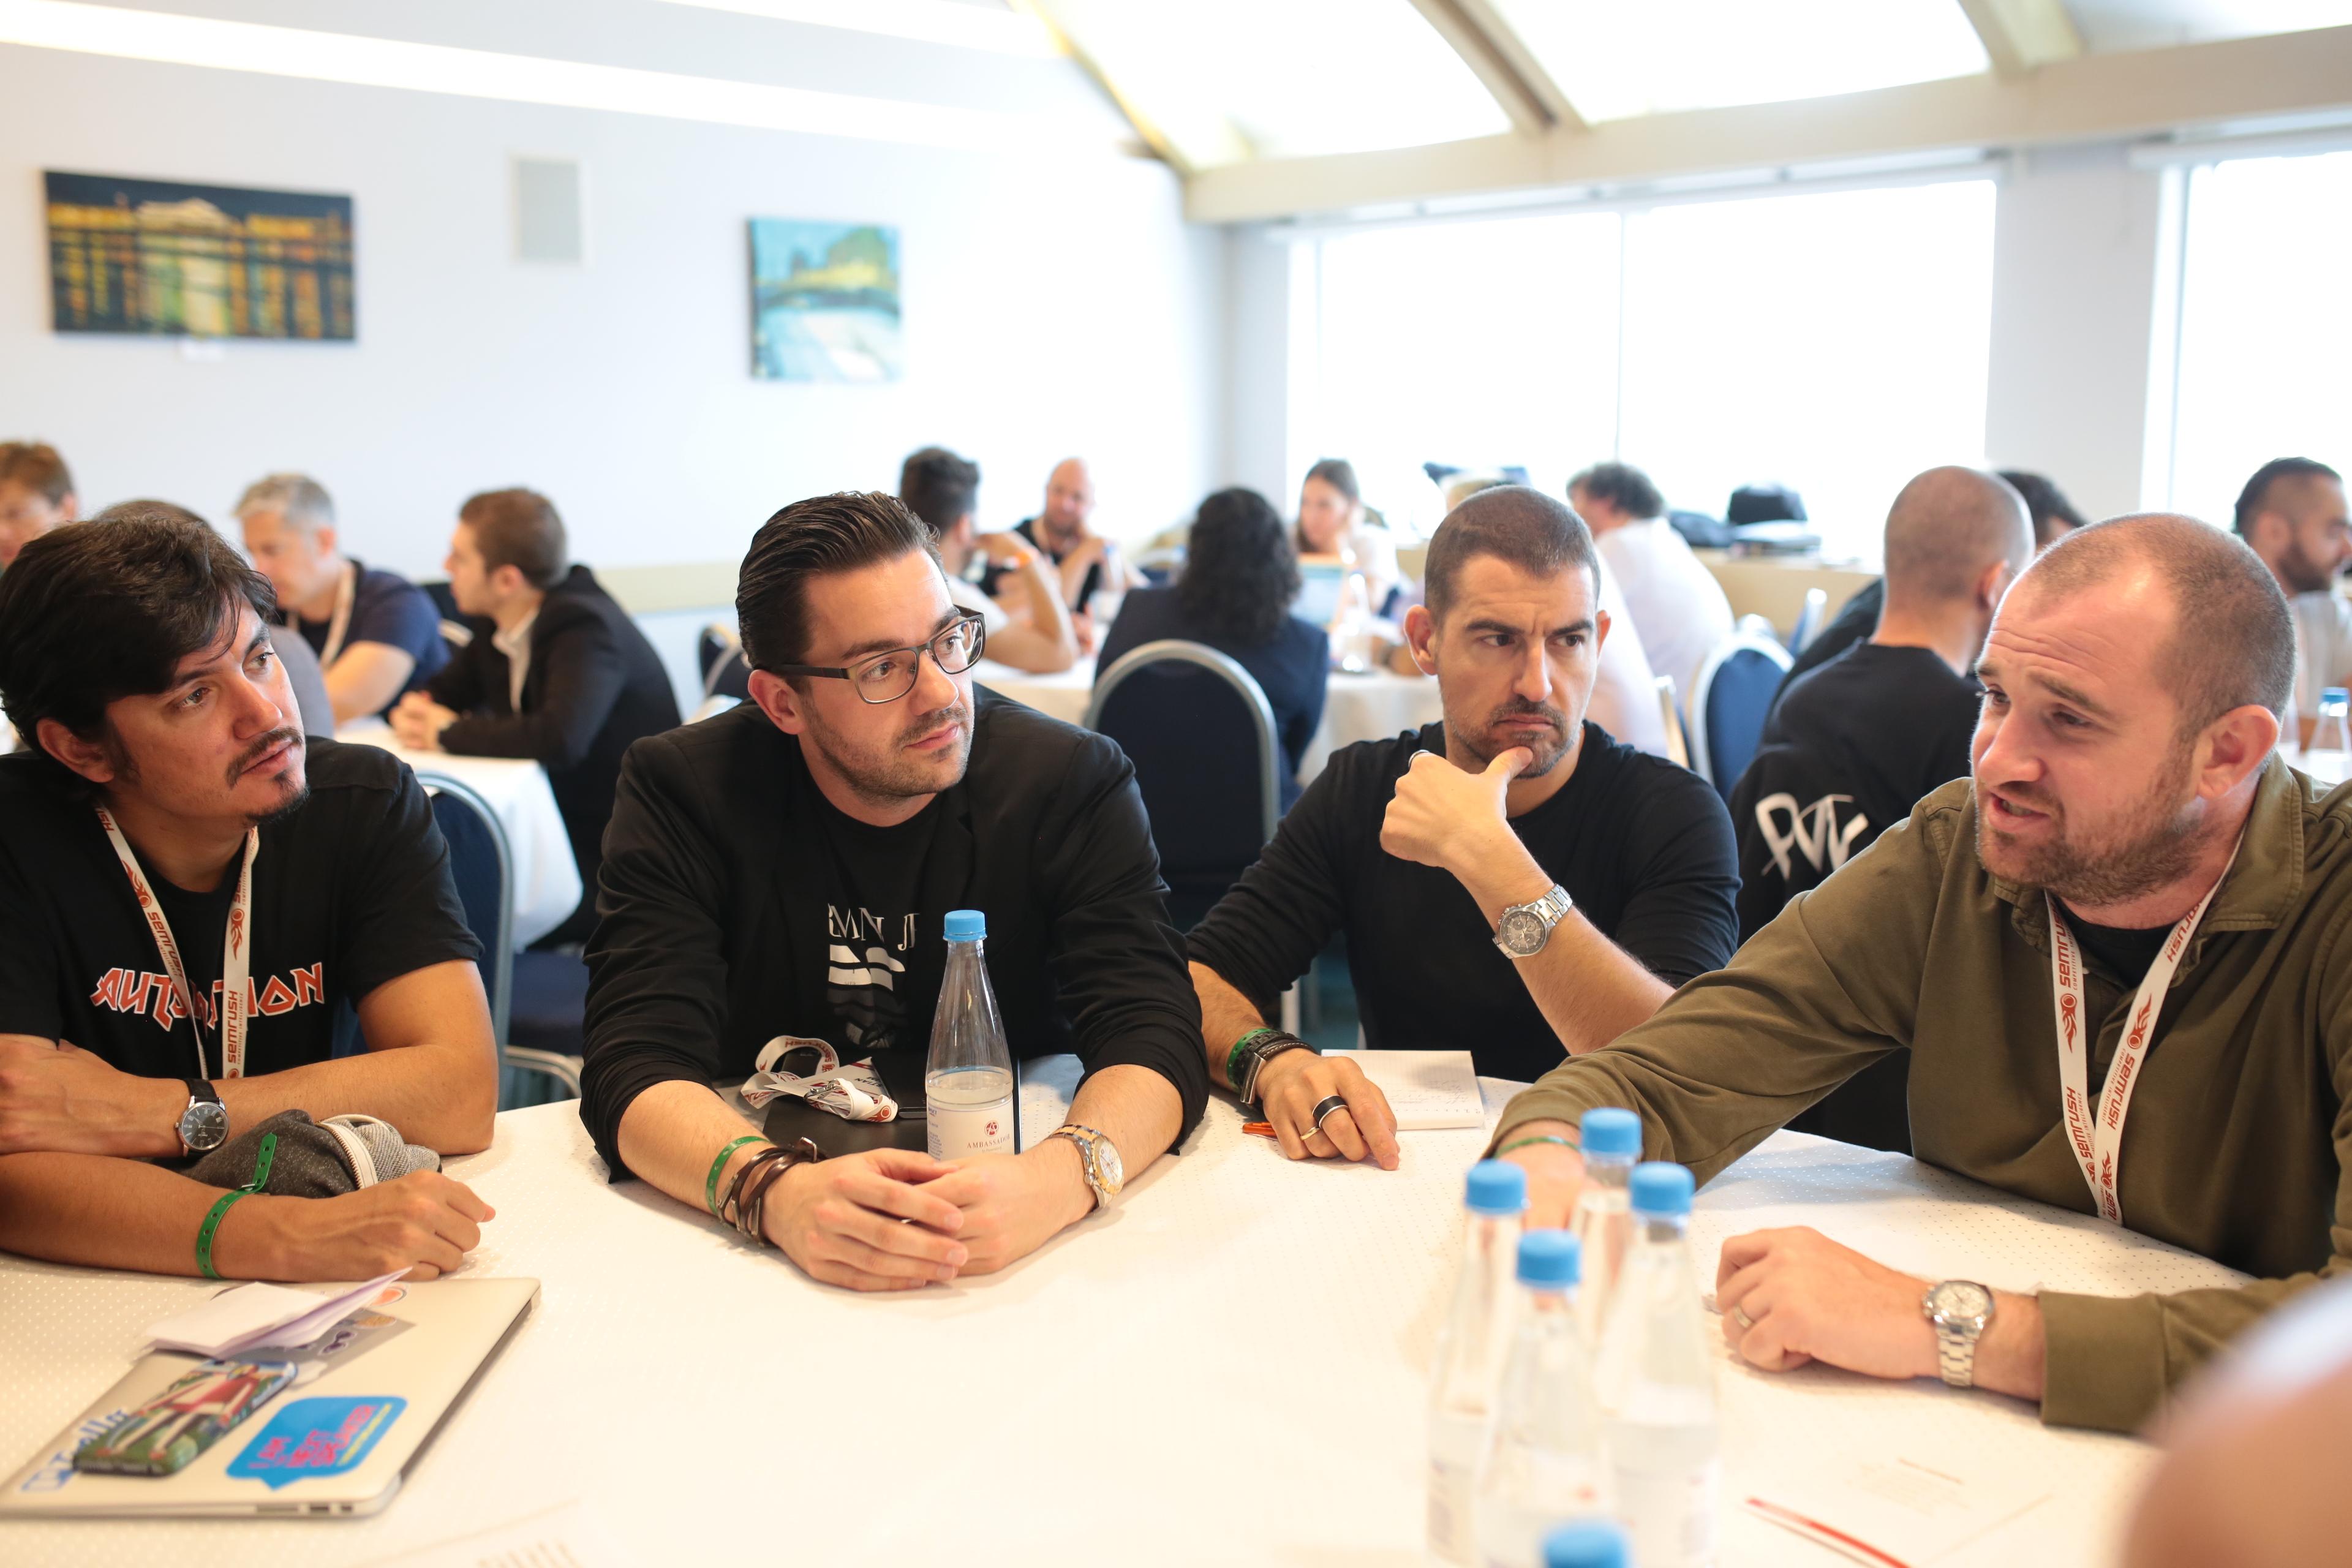 White Nights SEMrush Meetup - Experts share their feedback on SEMrush tools